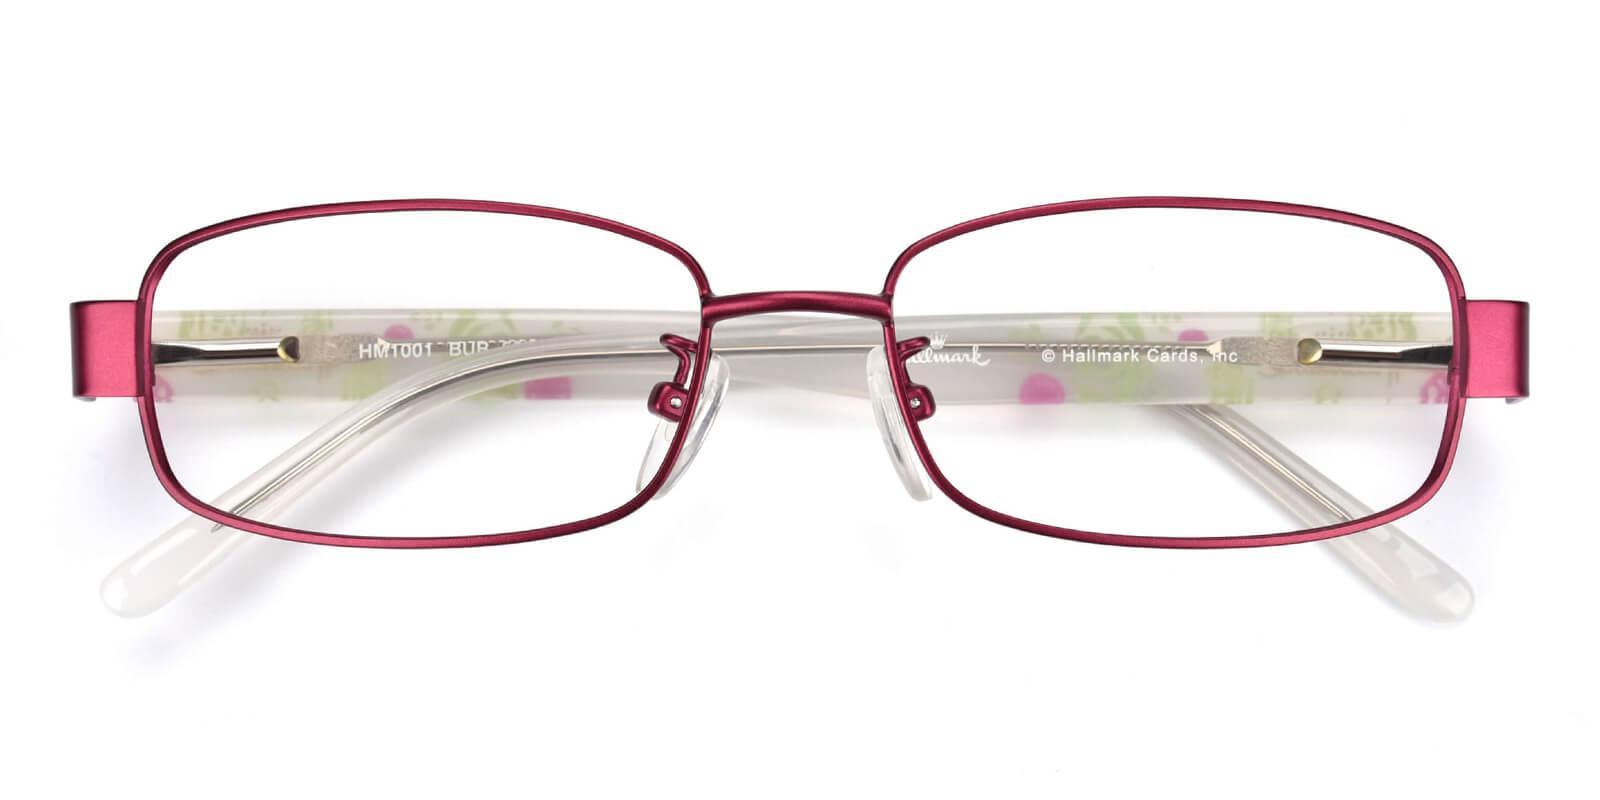 Katelley-Purple-Rectangle-Combination-Eyeglasses-detail